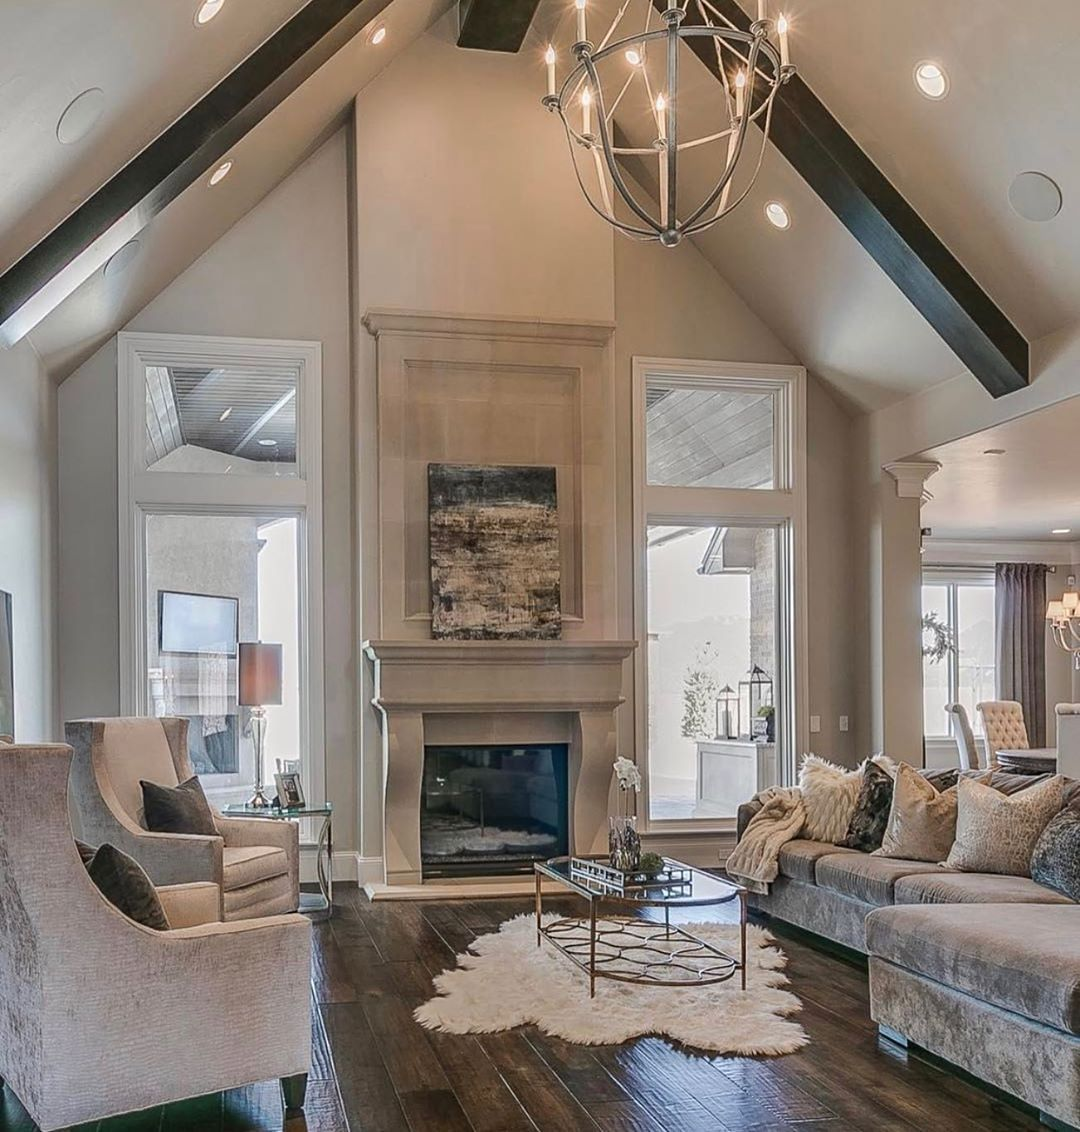 Best Rated Home Decor Interior Design School Trending Decor